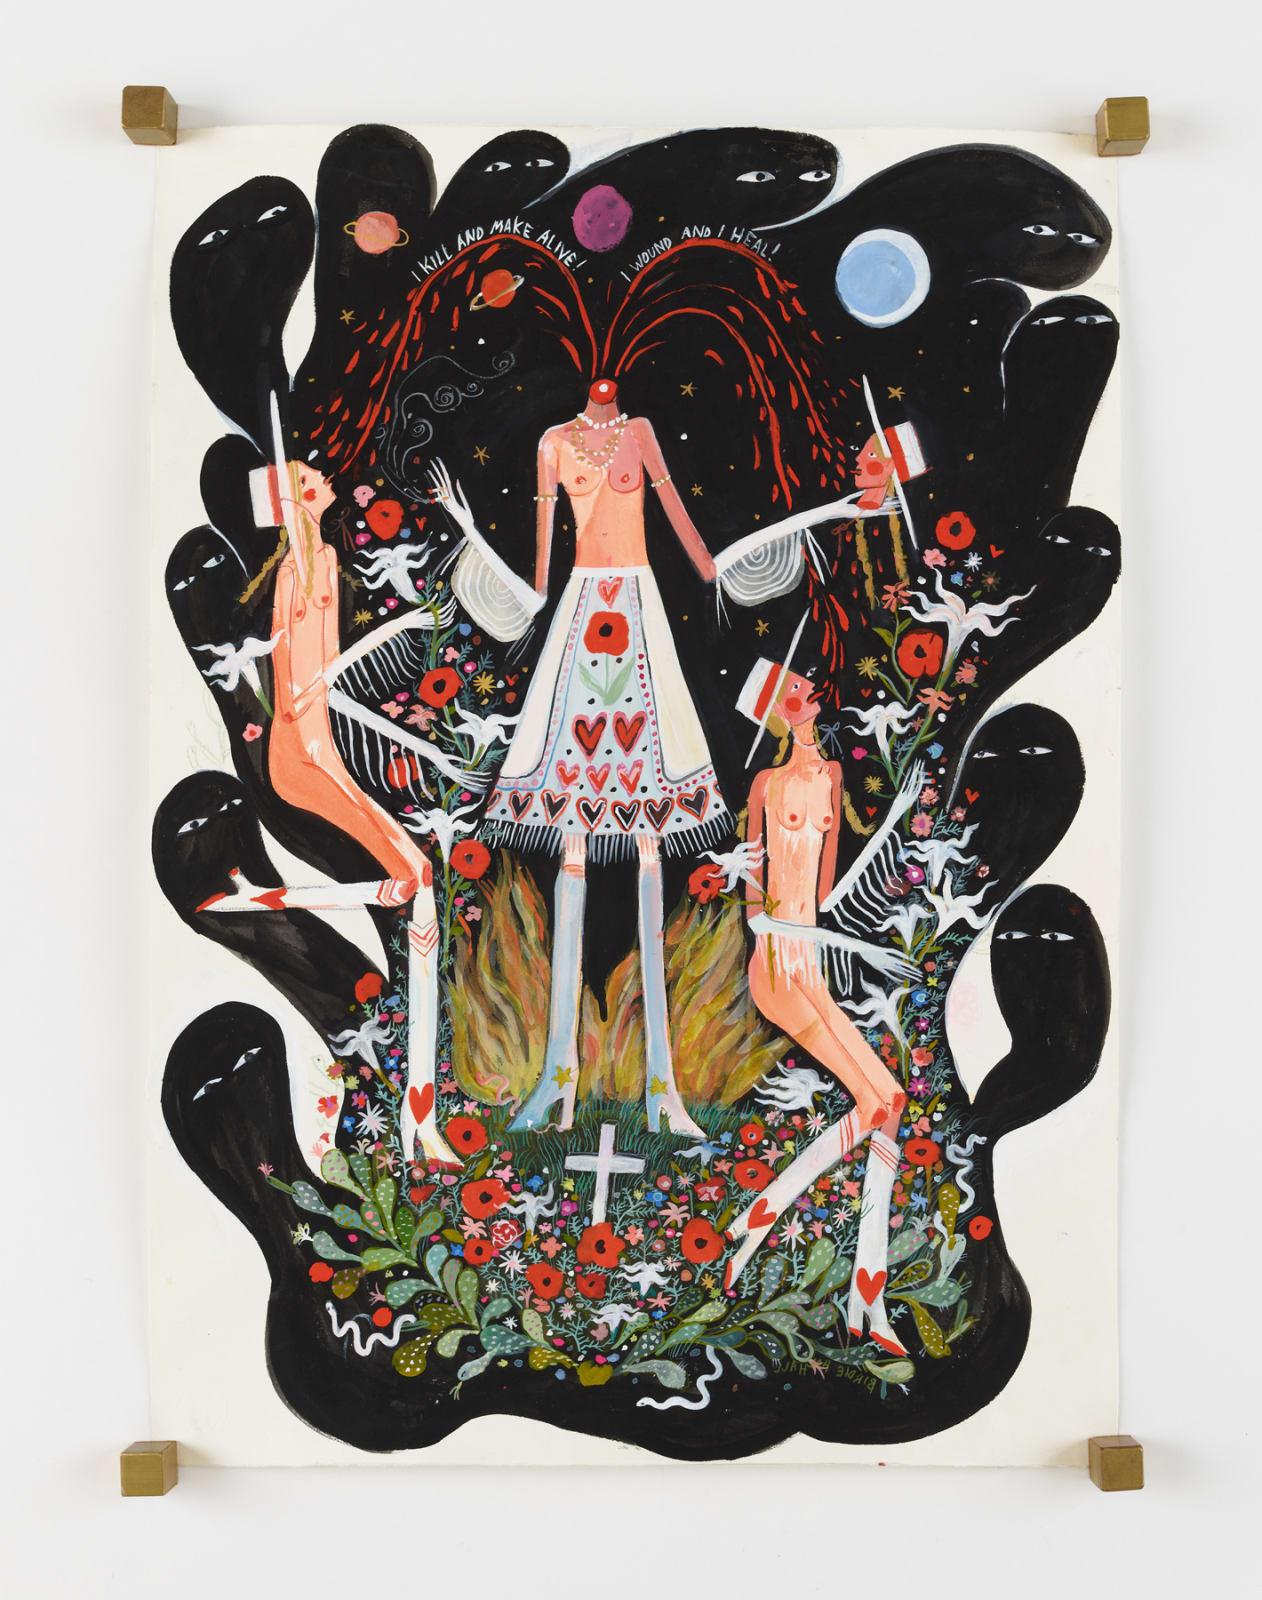 Birdie Hall, Kundalini Contradiction Cowgirls, 2020